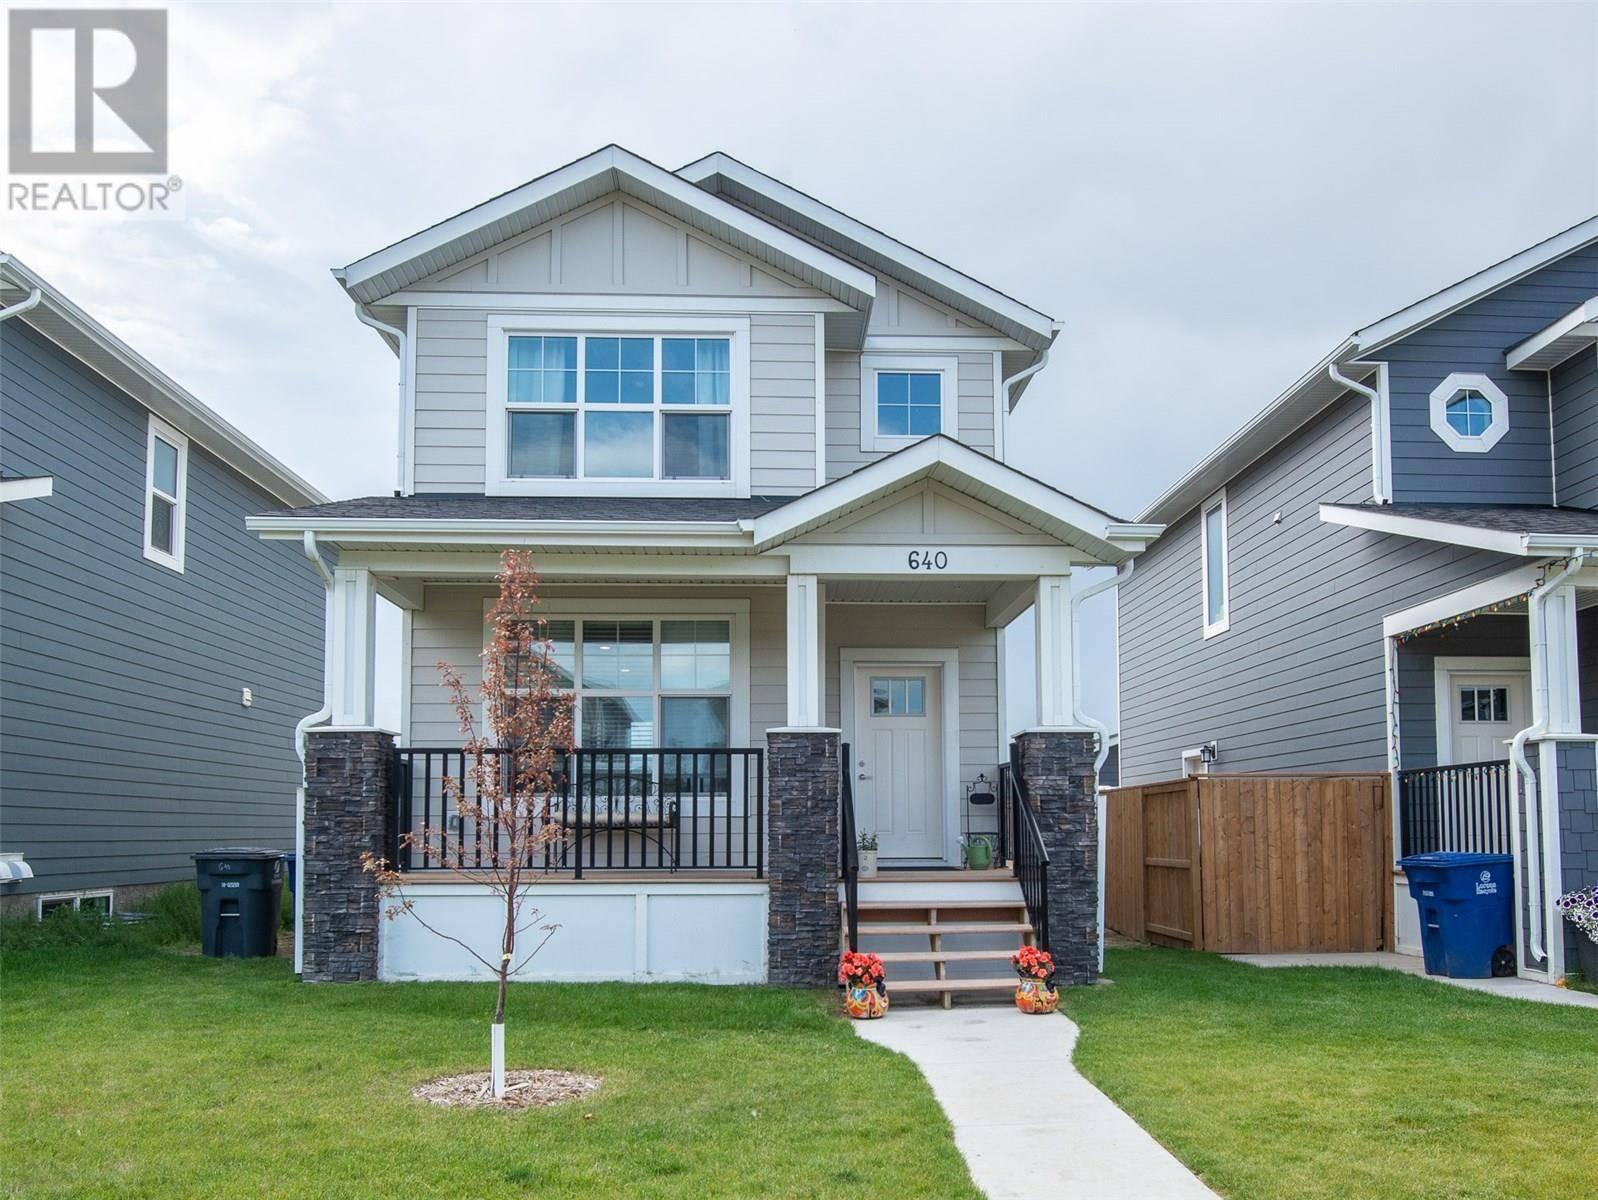 House for sale at 640 Meadows Blvd Saskatoon Saskatchewan - MLS: SK783361